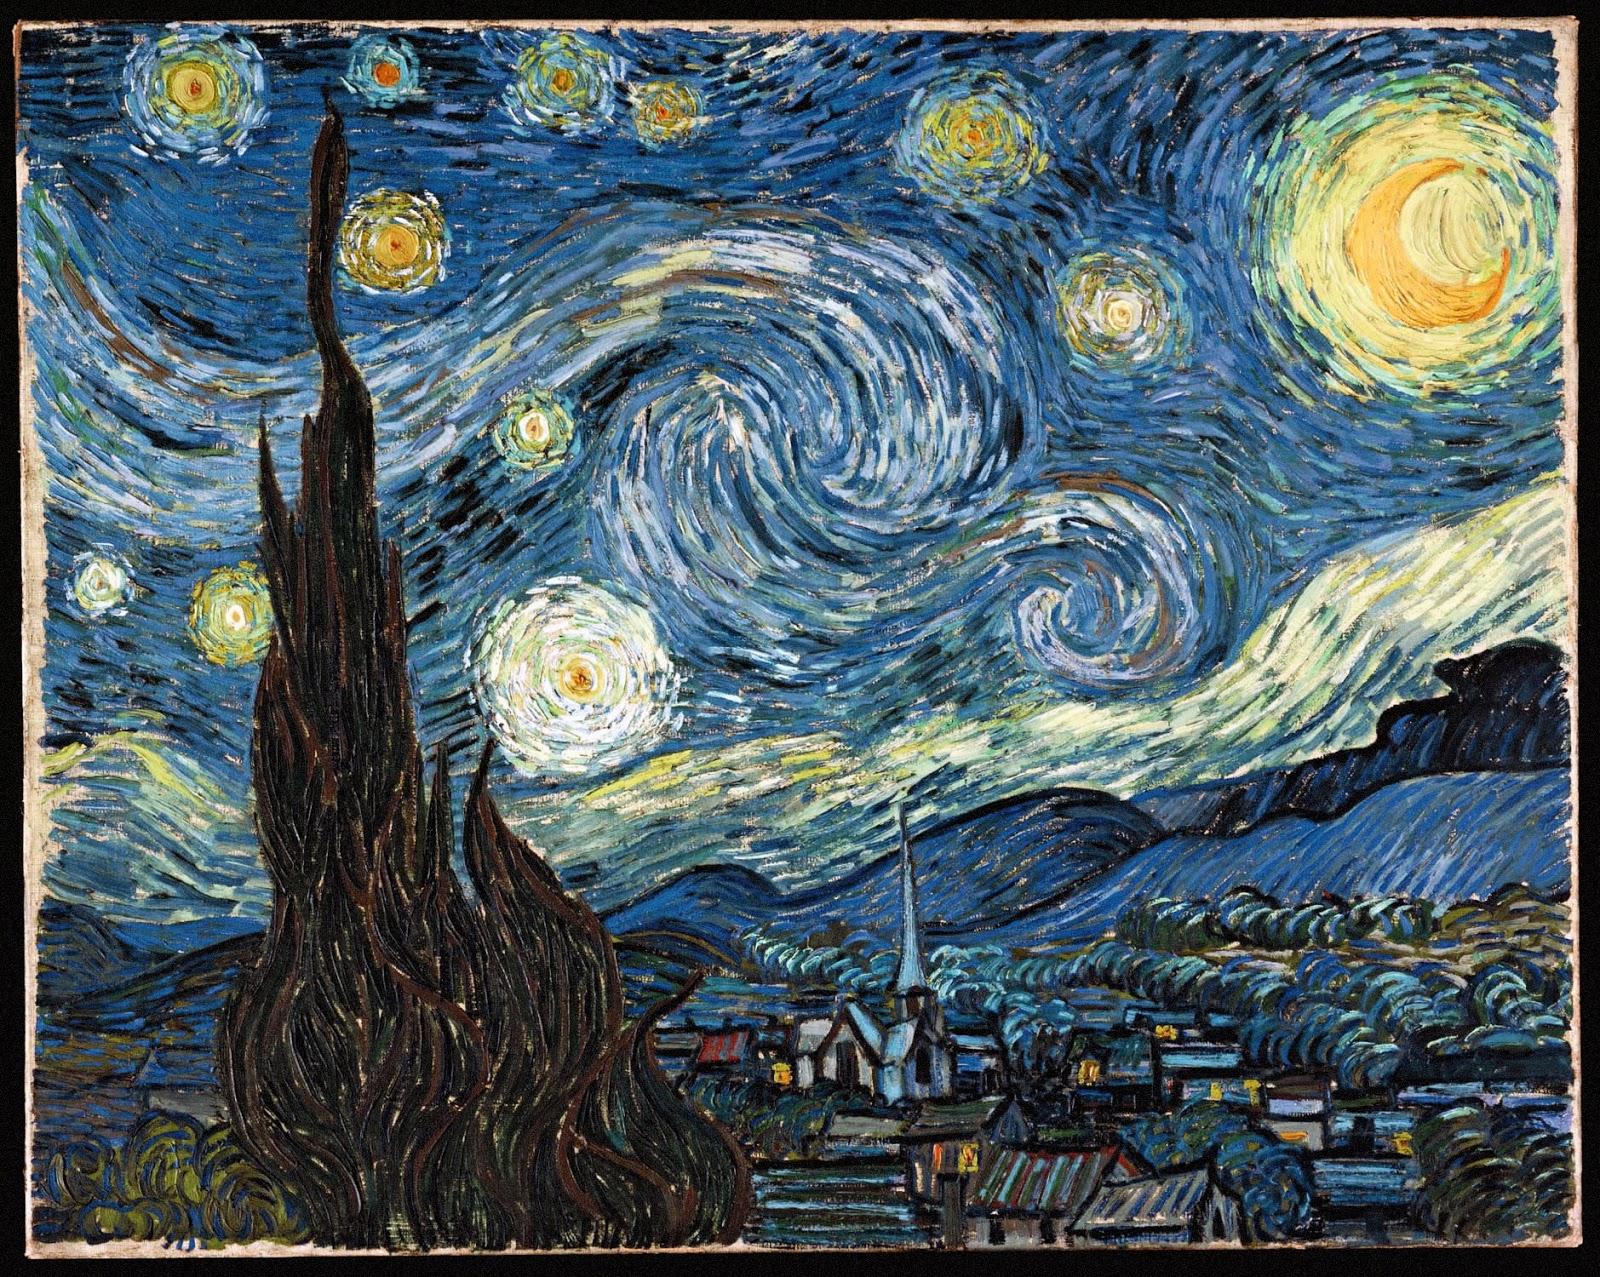 http://4.bp.blogspot.com/-TB3rpLUgIs4/T6VdDmn7GzI/AAAAAAAAAu0/mSY842GTy54/s1600/Vincent_van_Gogh_Starry_Night.jpg